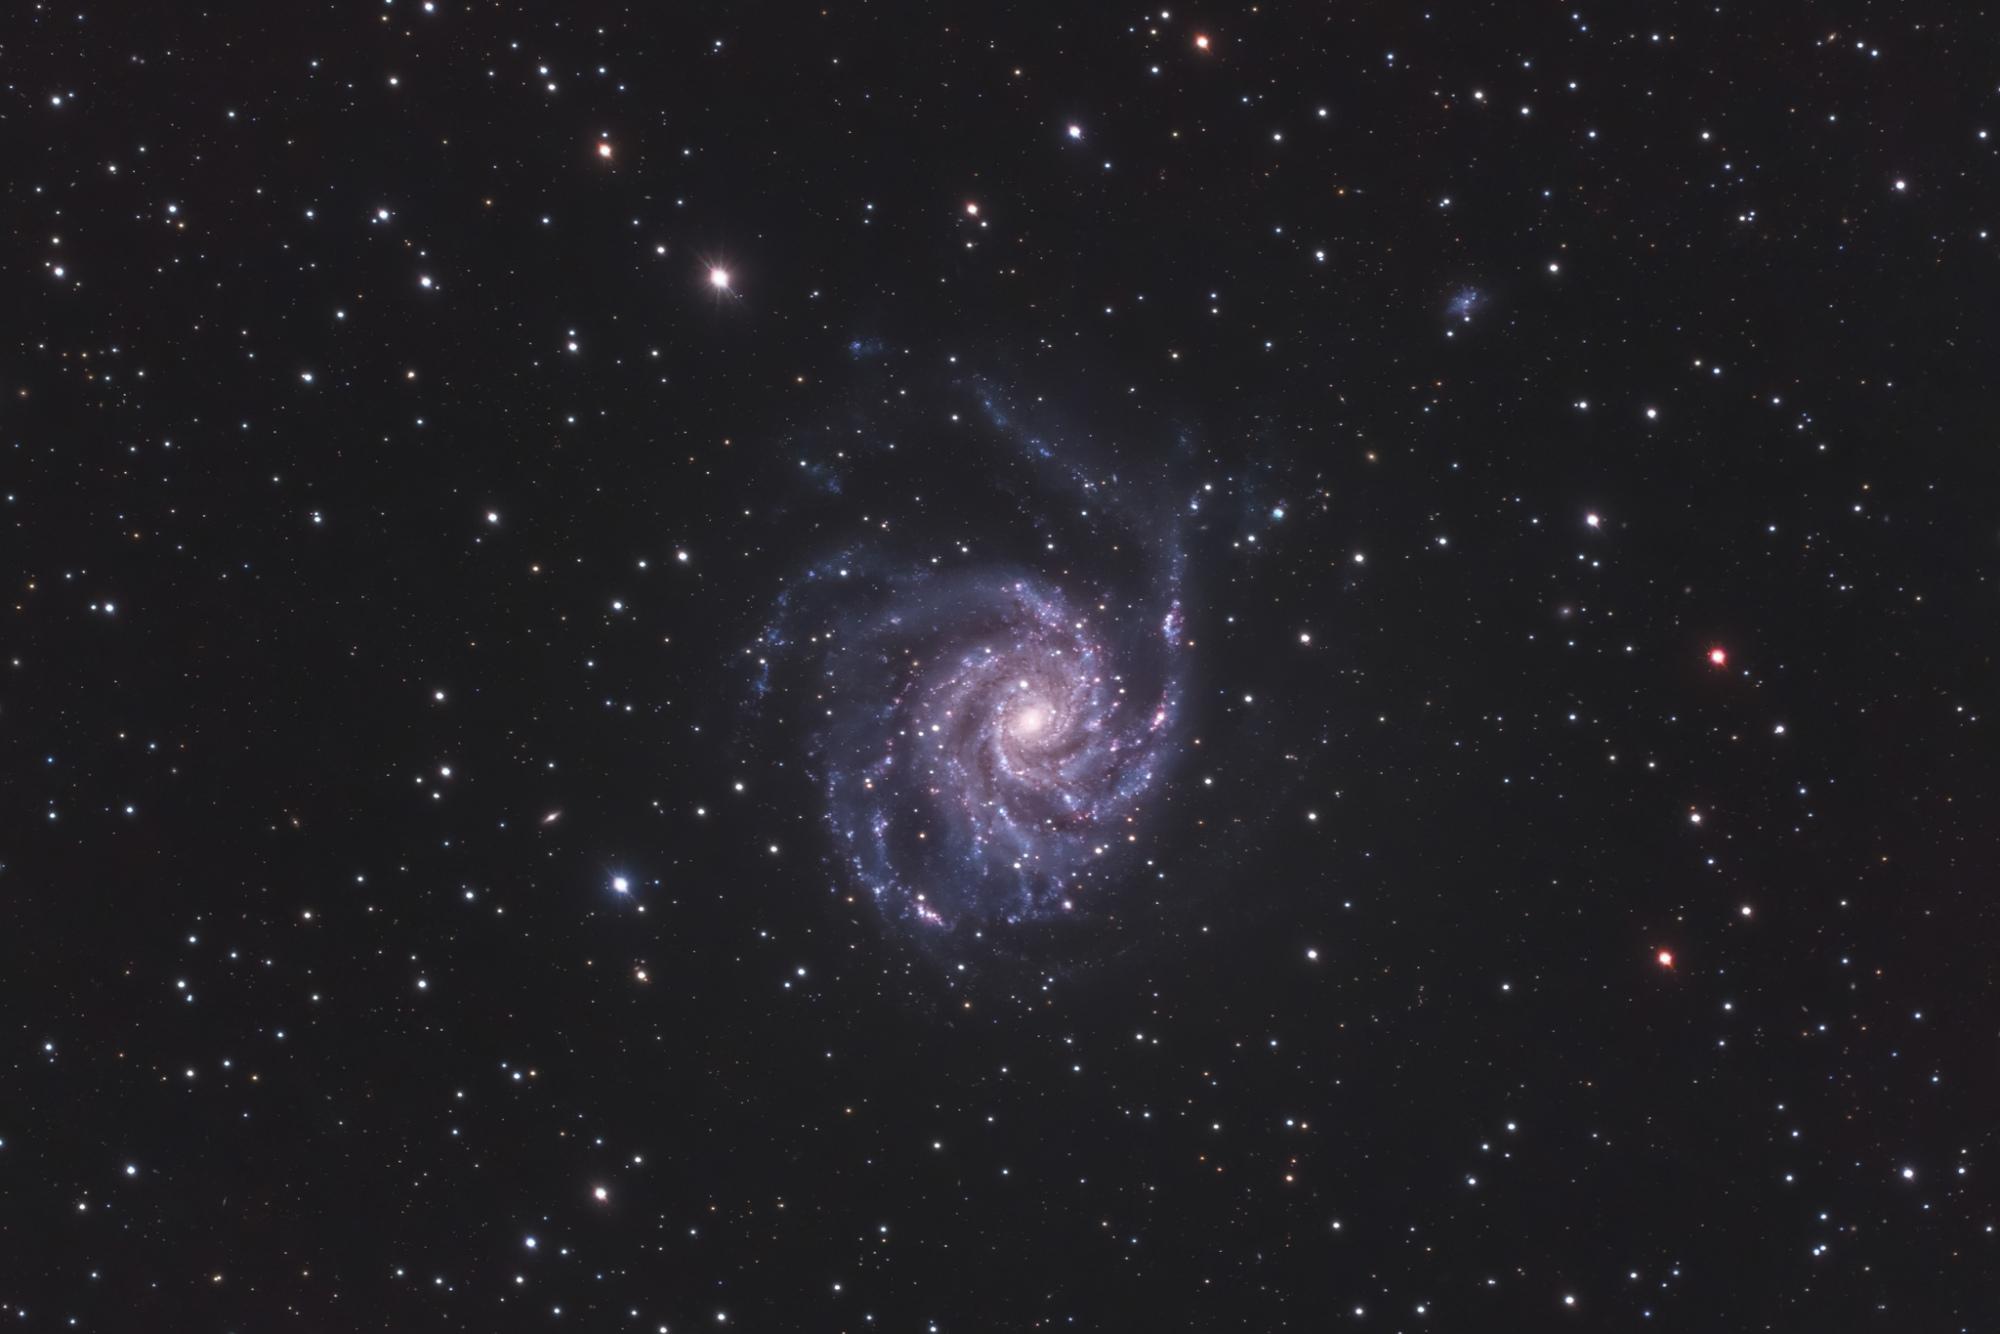 M101-drizzle-2048-crop.JPG